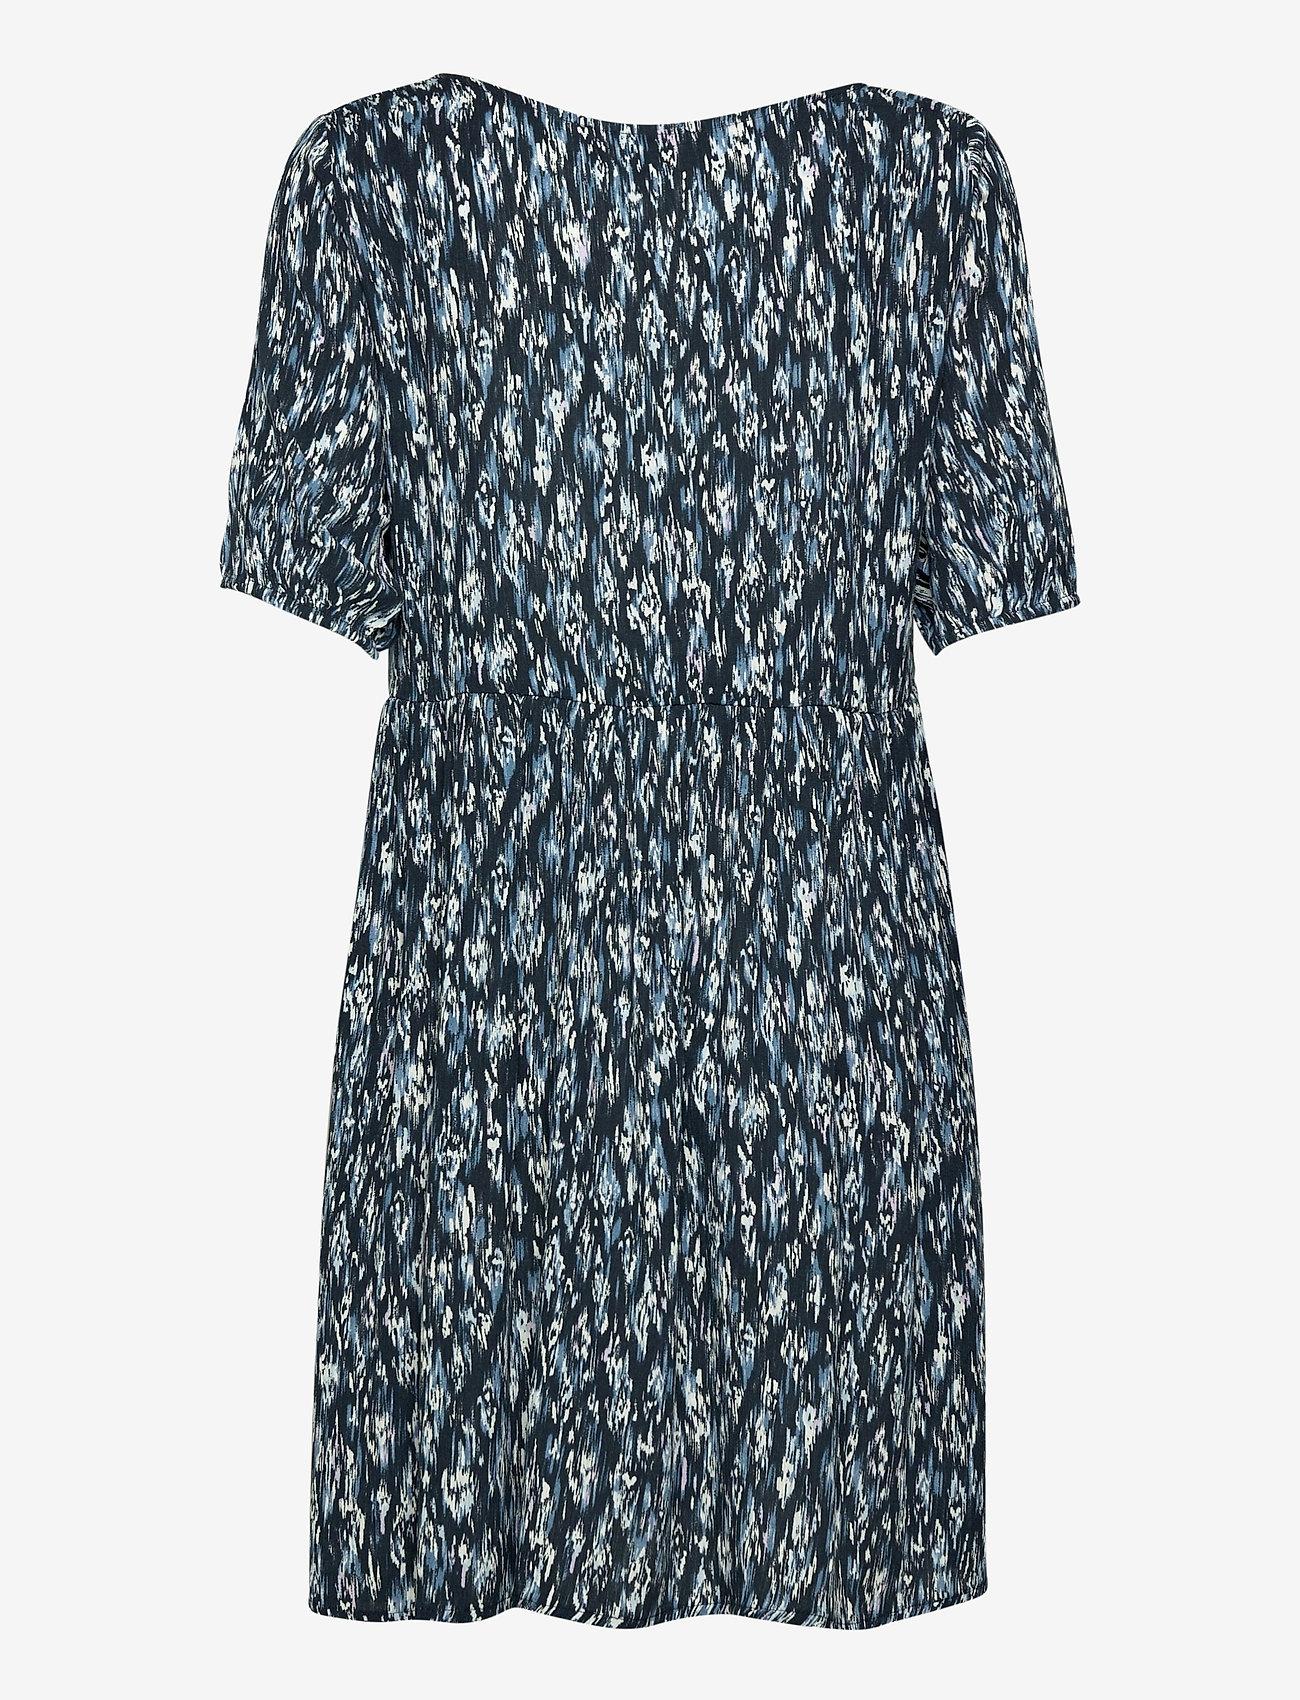 ICHI - IHMARRAKECH AOP DR7 - summer dresses - total eclipse - 1